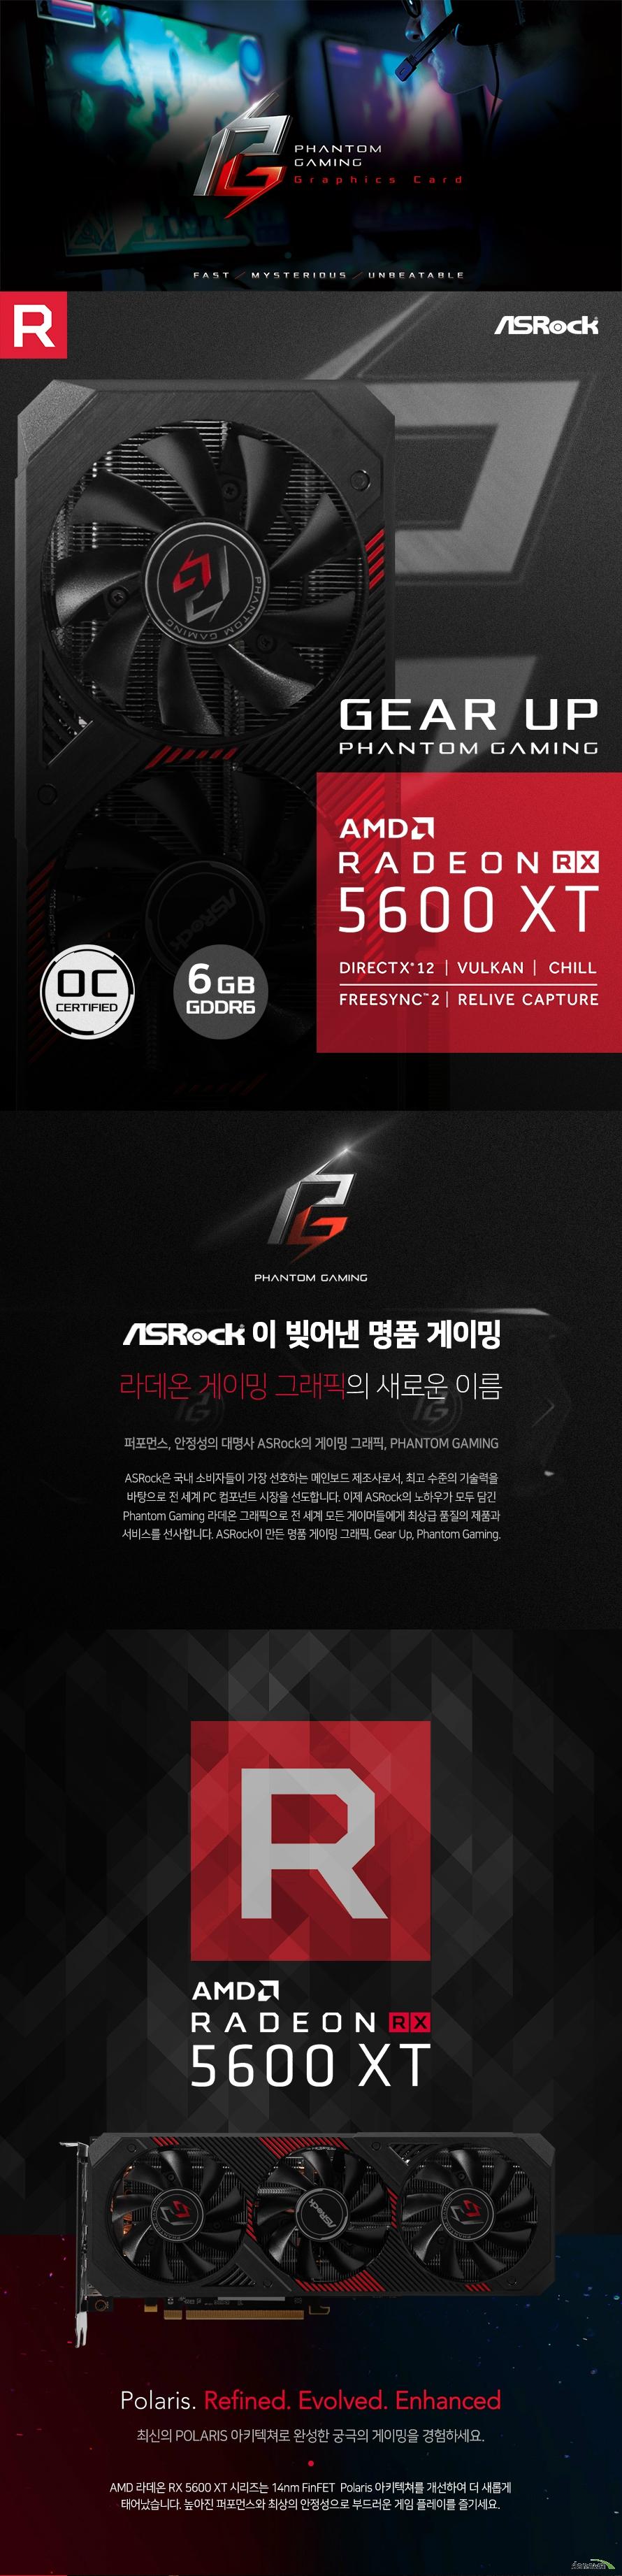 ASRock Phantom Gaming D3 라데온 RX 5600 XT OC D6 6GB 에즈윈